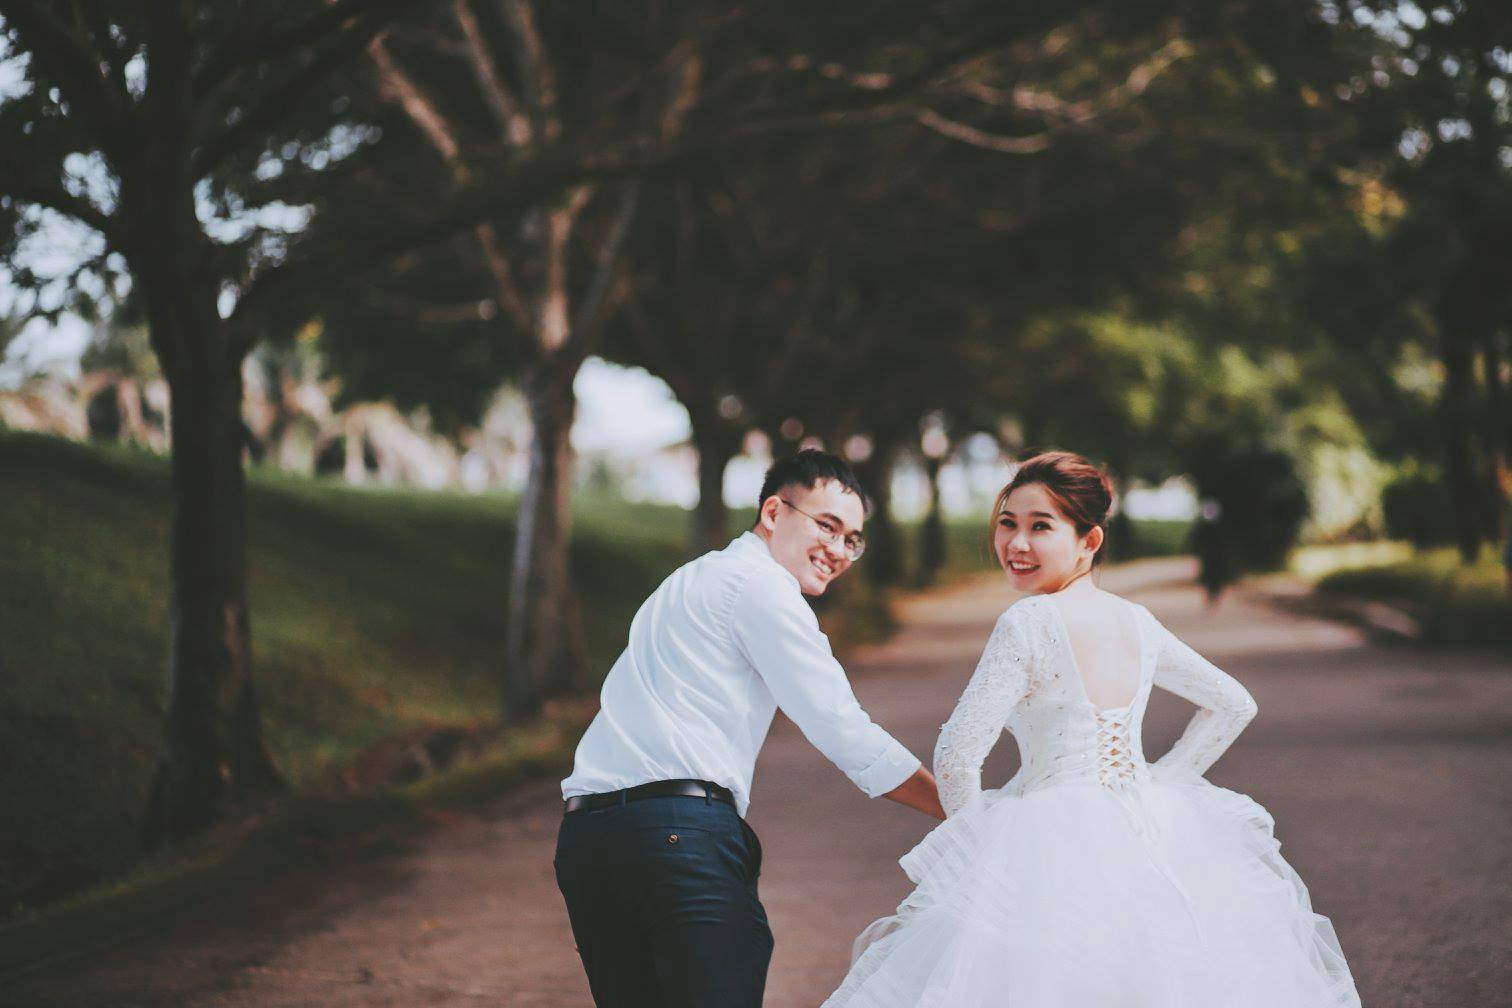 KA CONCEPT STUDIO | Wedding | Portrait Photographer Ipoh